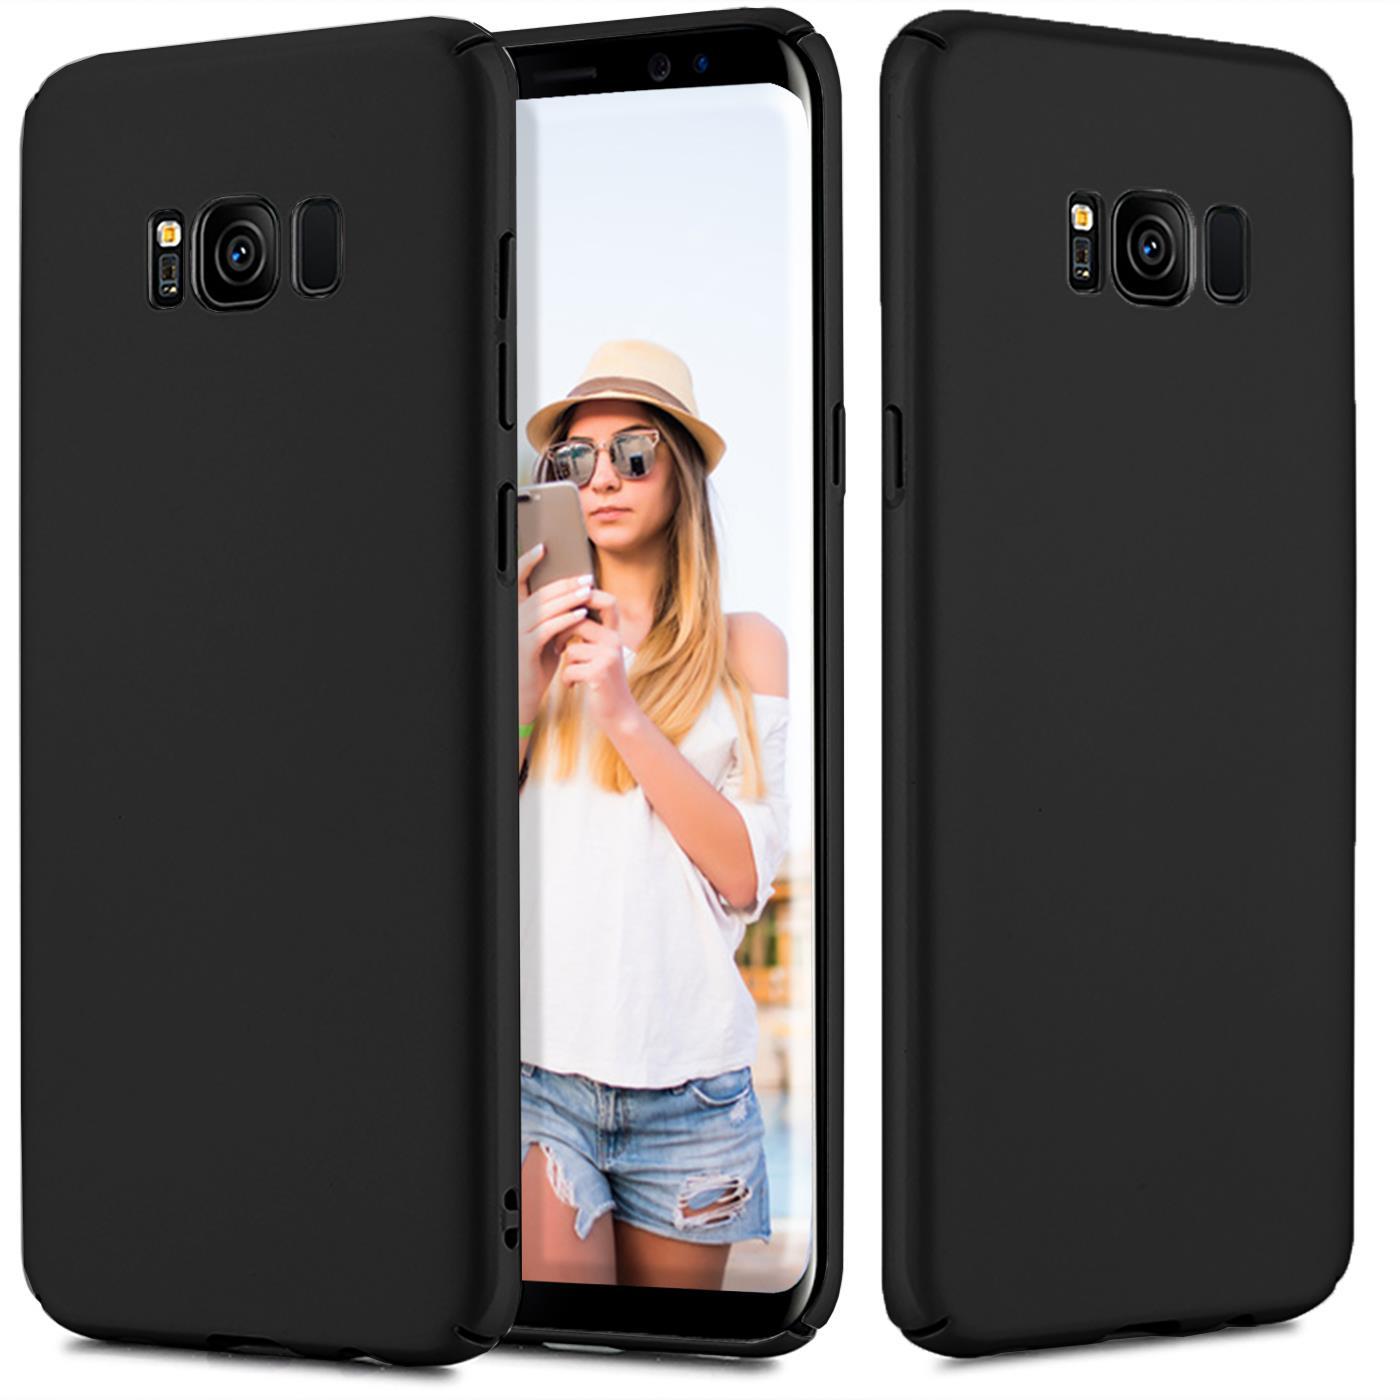 Hard-Back-Case-Cover-Samsung-Galaxy-s4-duenn-Cover-Slim-Shockproof-Rugged Indexbild 8